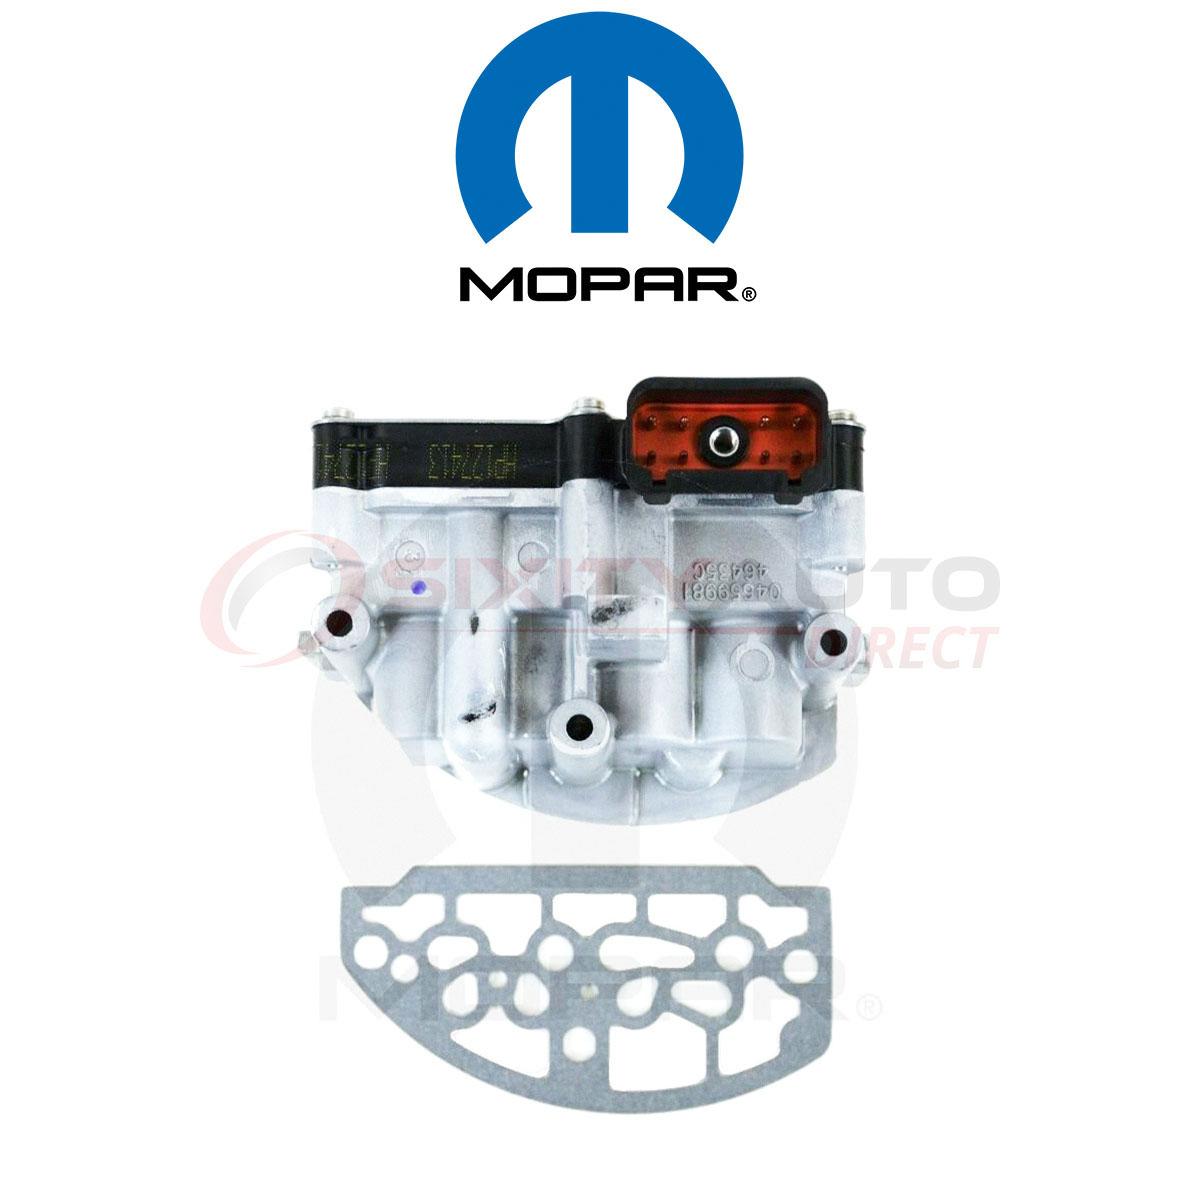 Mopar Auto Transmission Kickdown Solenoid For 1997